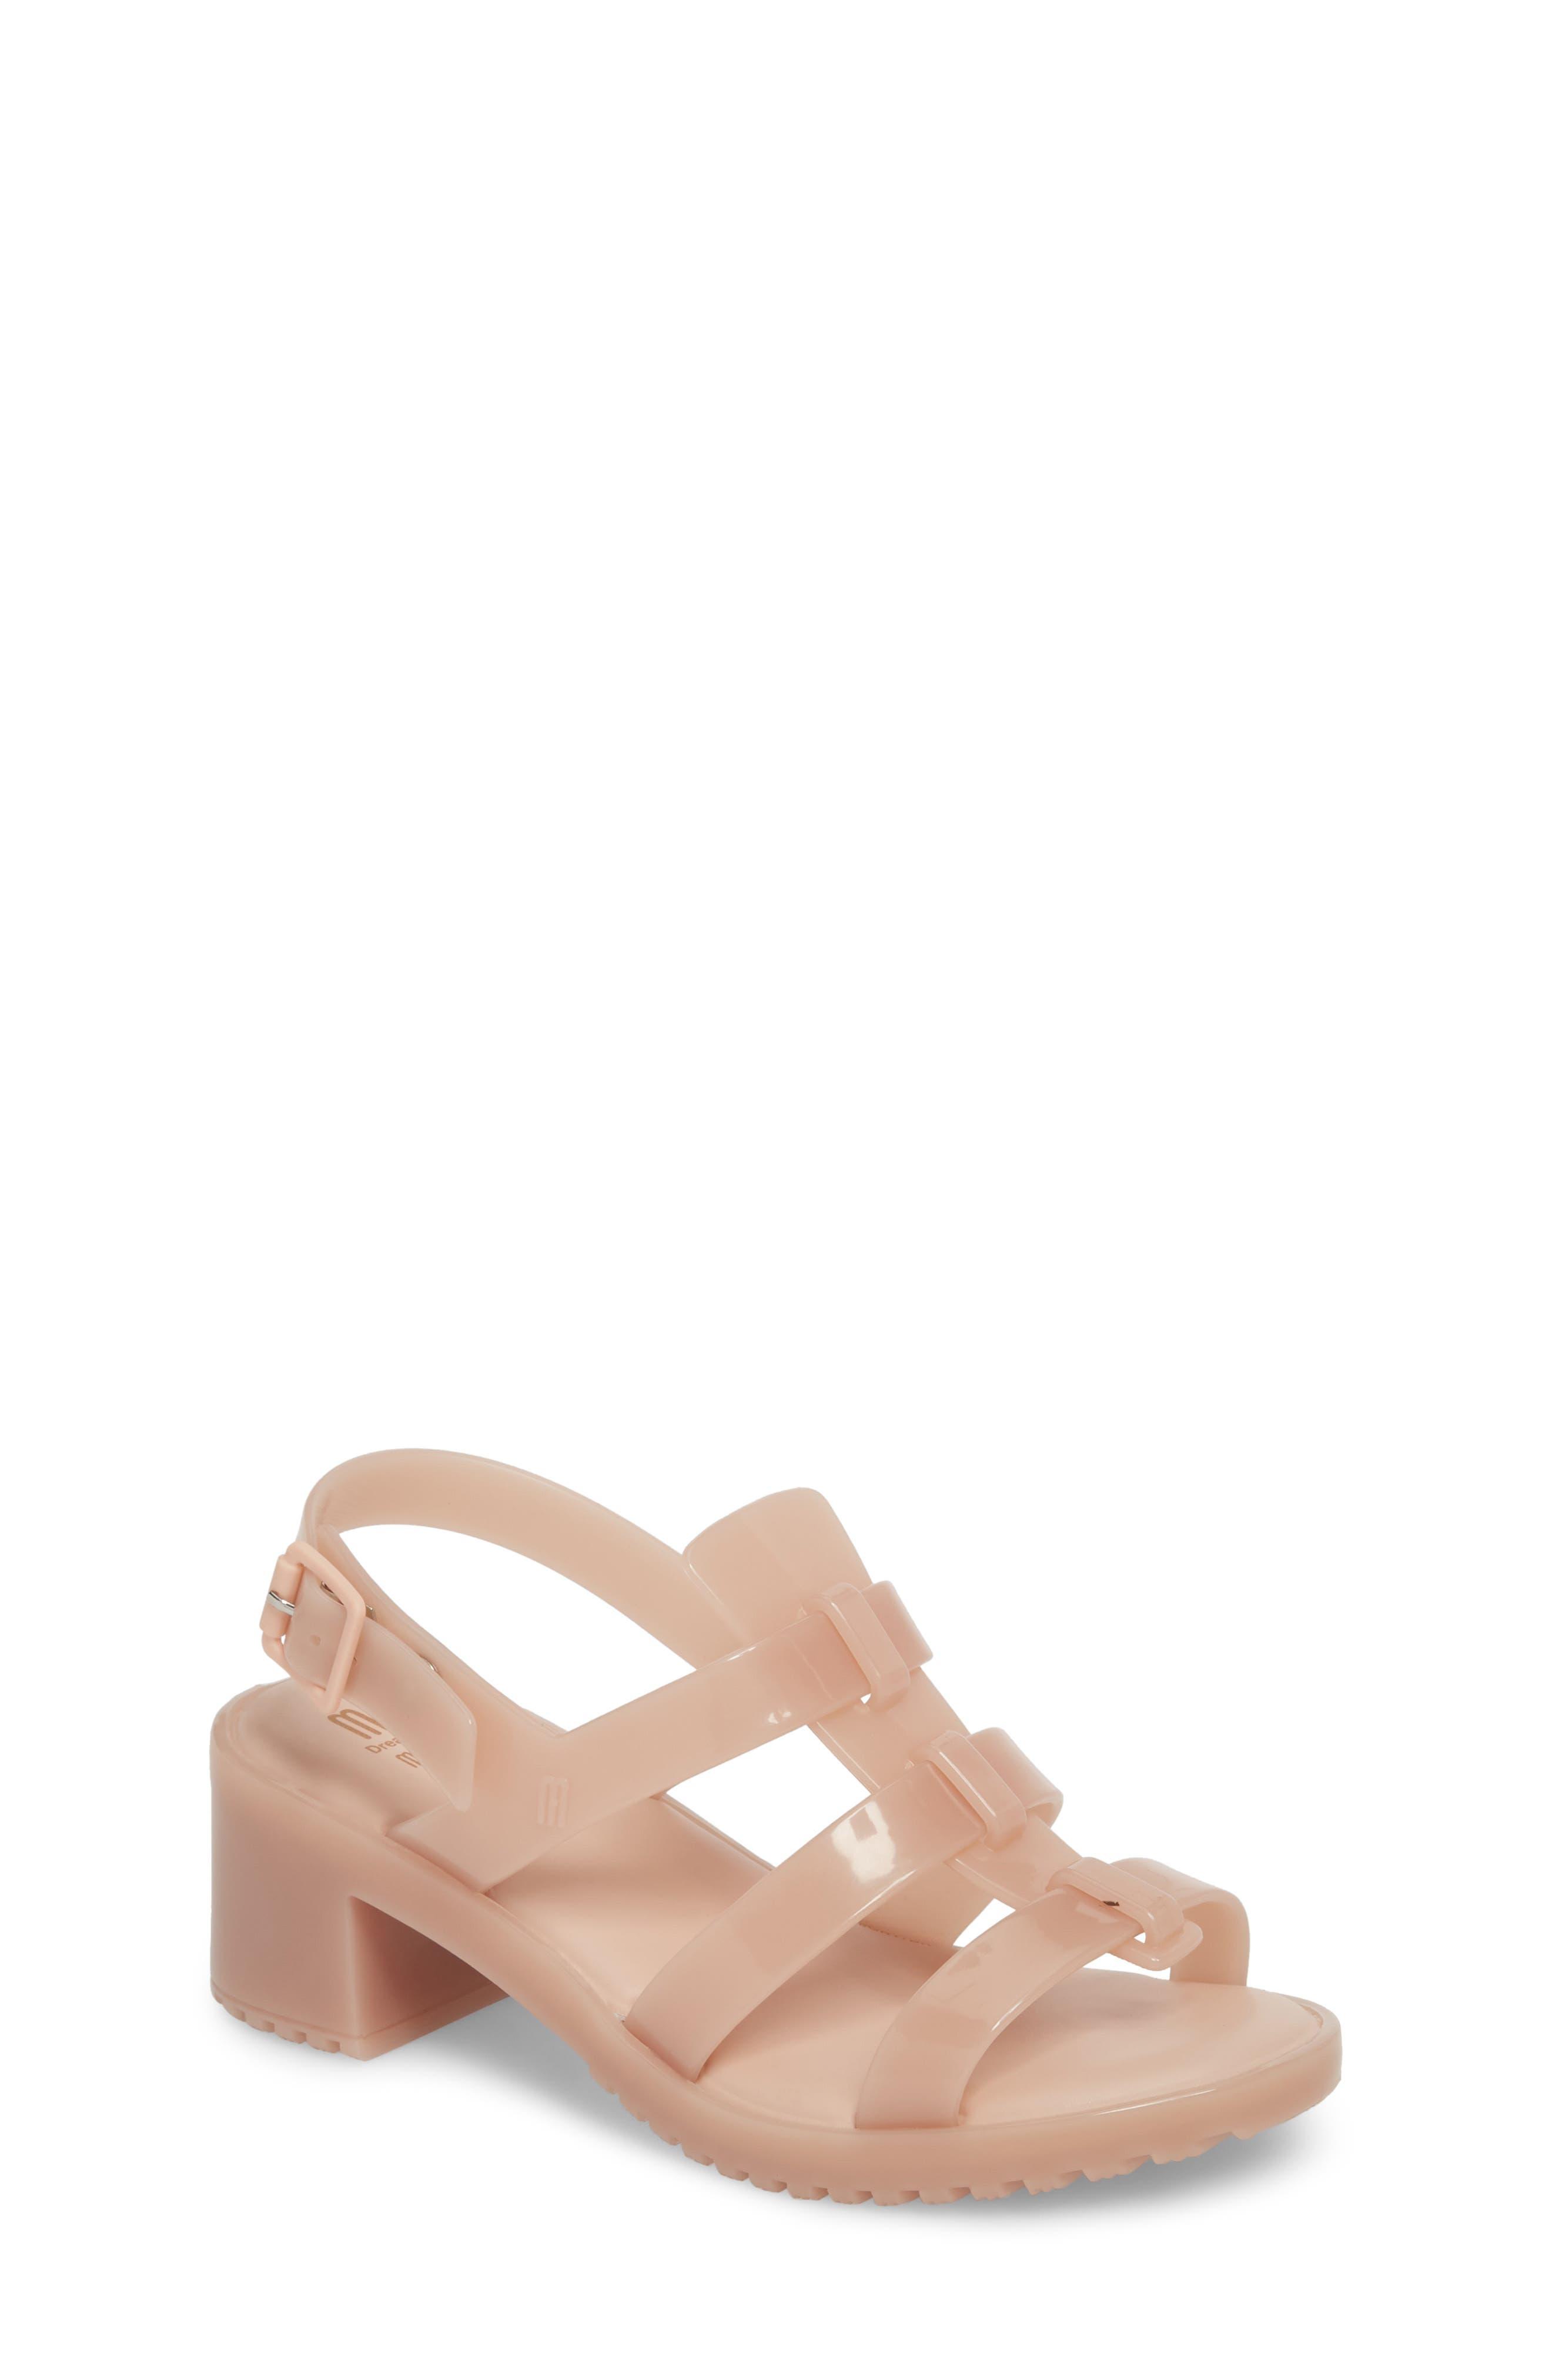 4d0d00b29cad Mini Melissa Kids  Shoes